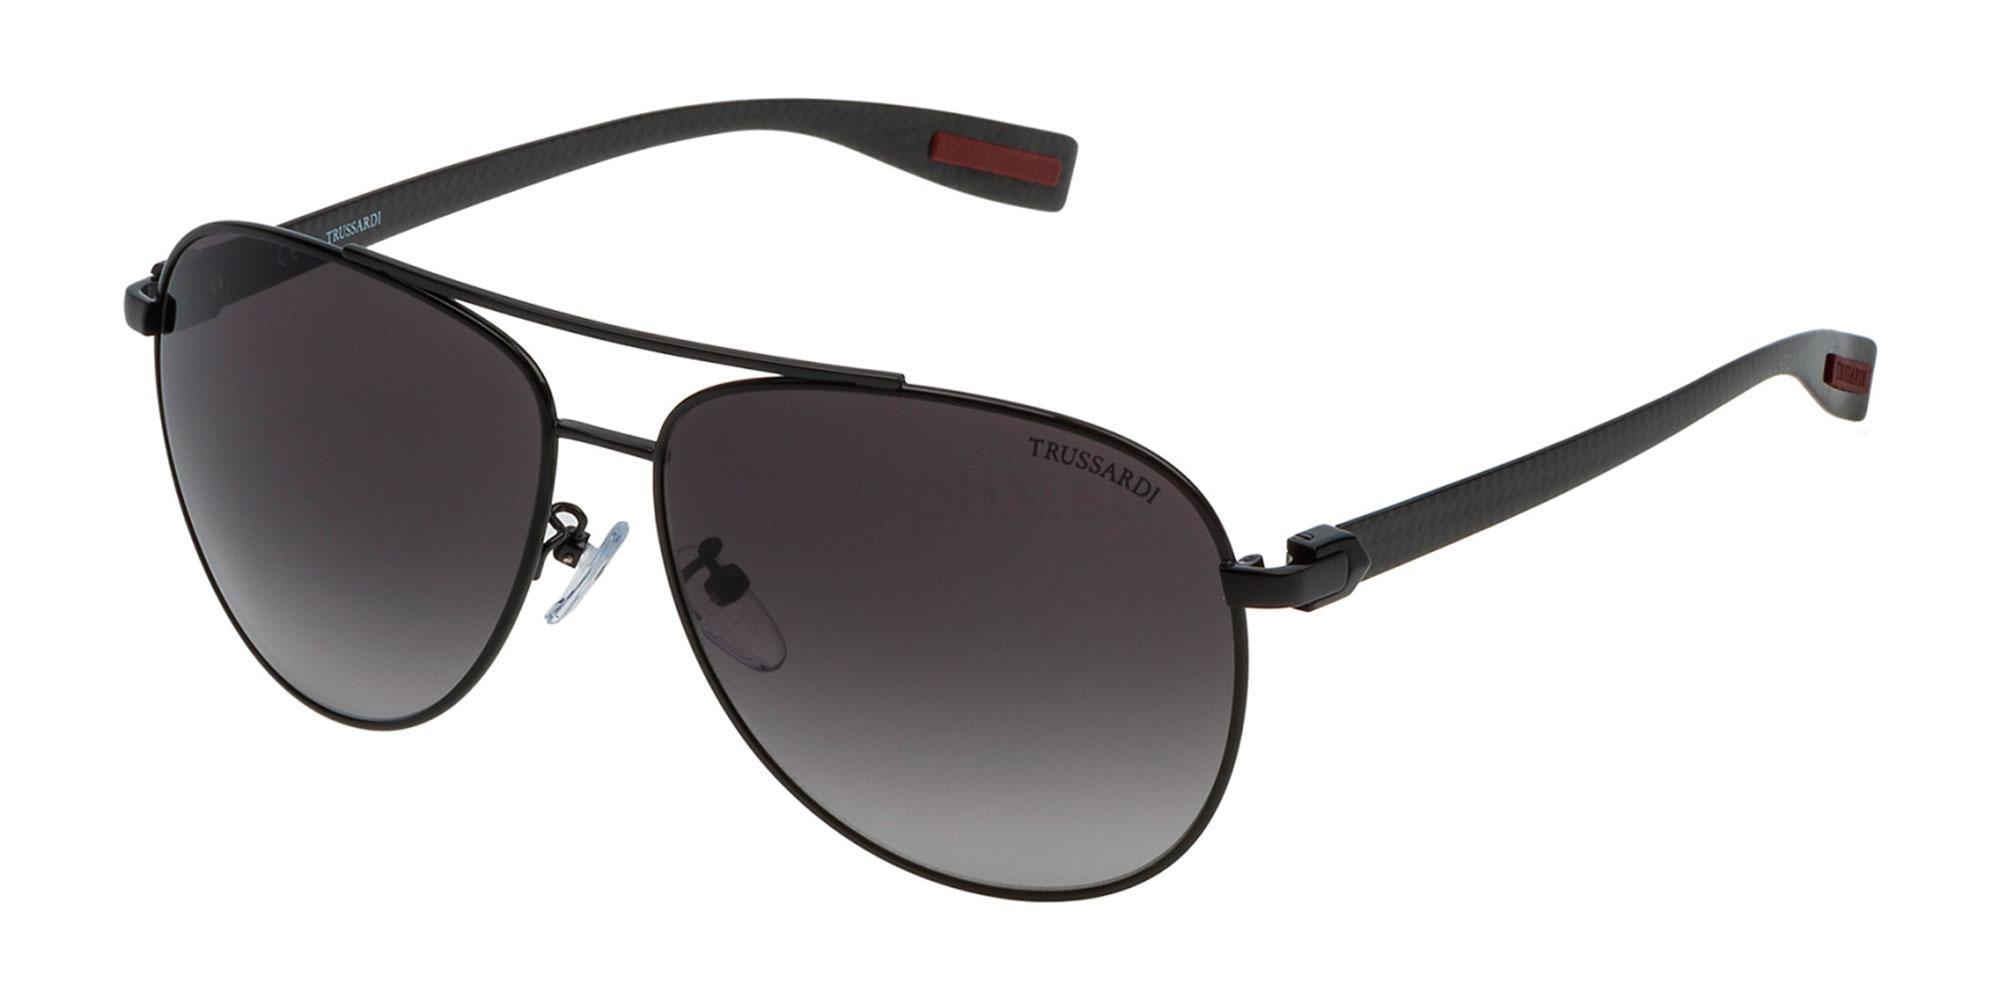 0530 STR175 Sunglasses, Trussardi